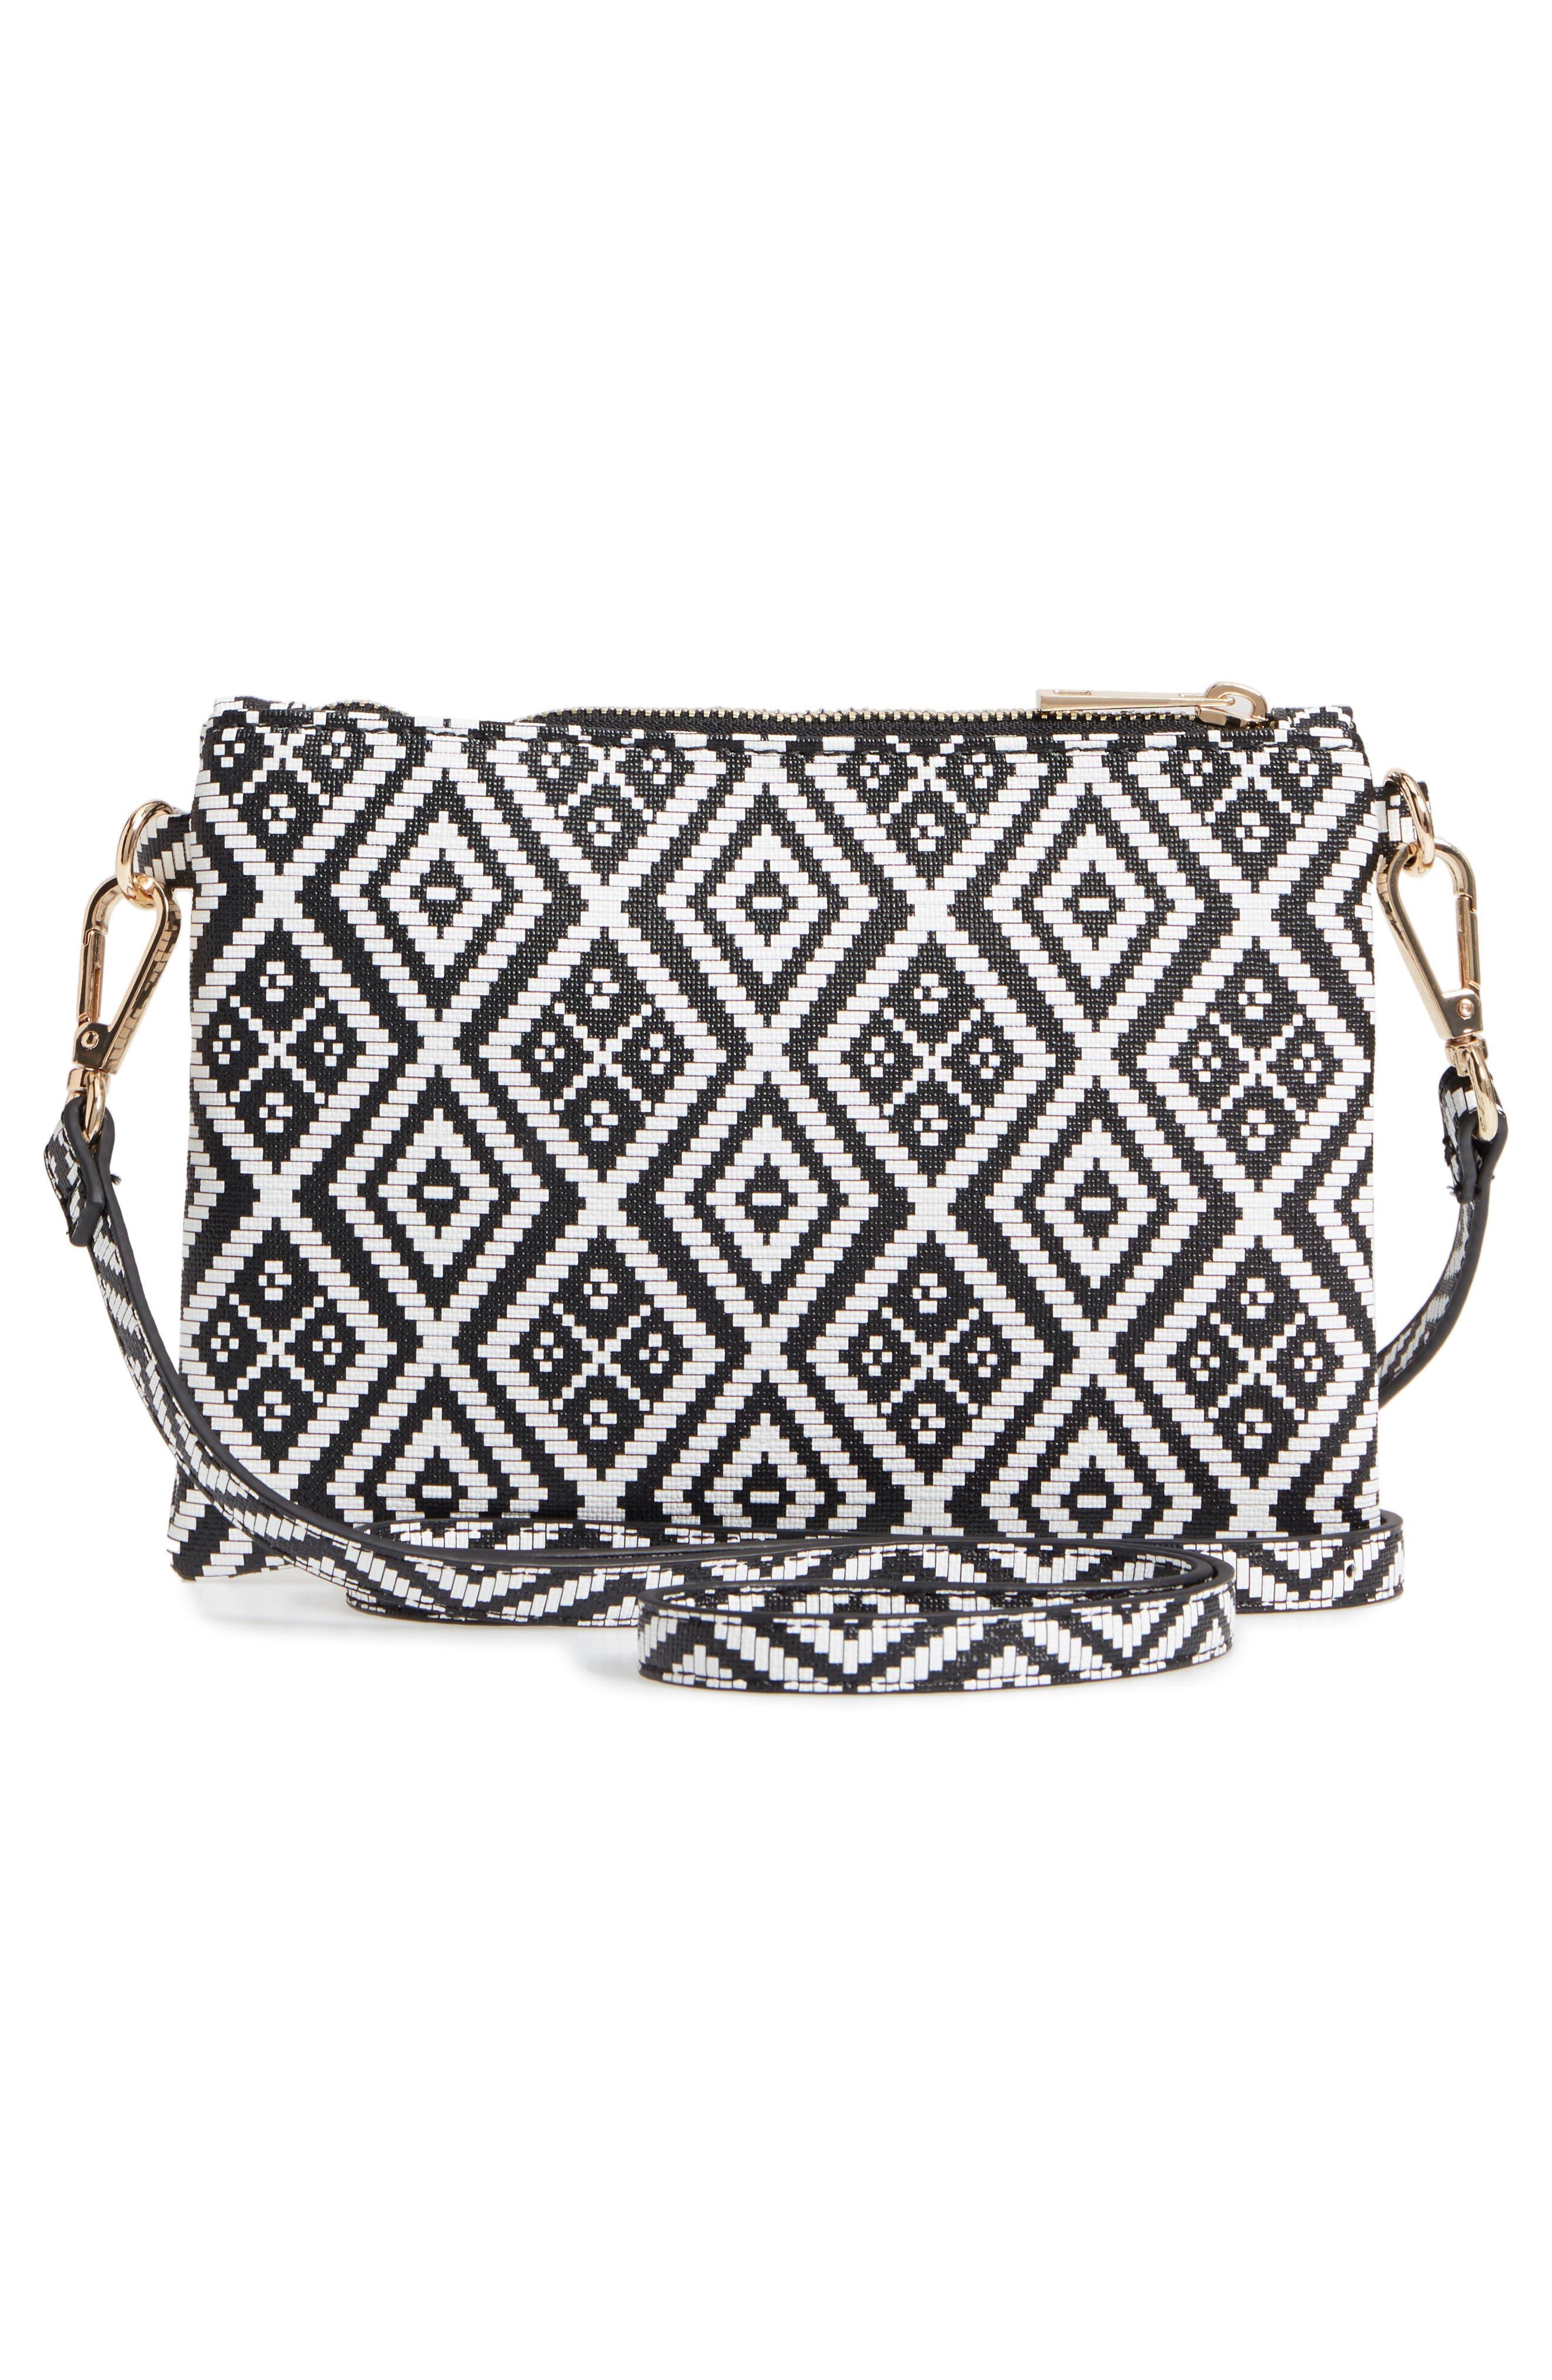 Weave Pattern Convertible Crossbody Wristlet,                             Alternate thumbnail 3, color,                             Black/ White